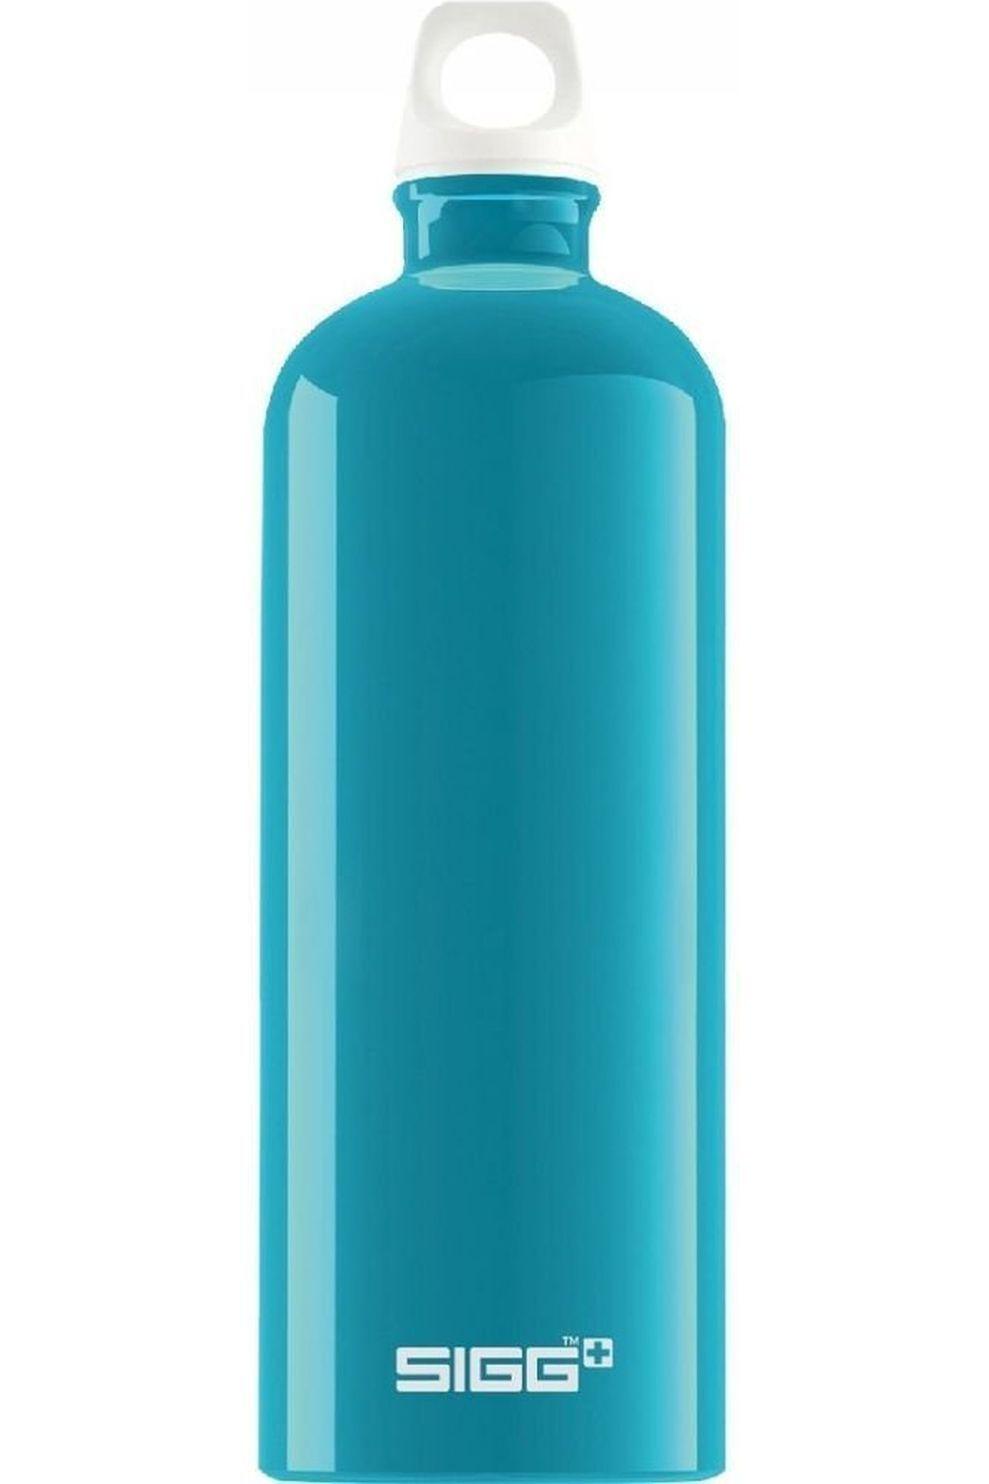 Sigg Drinkfles Fabulous 1L - Blauw/Wit